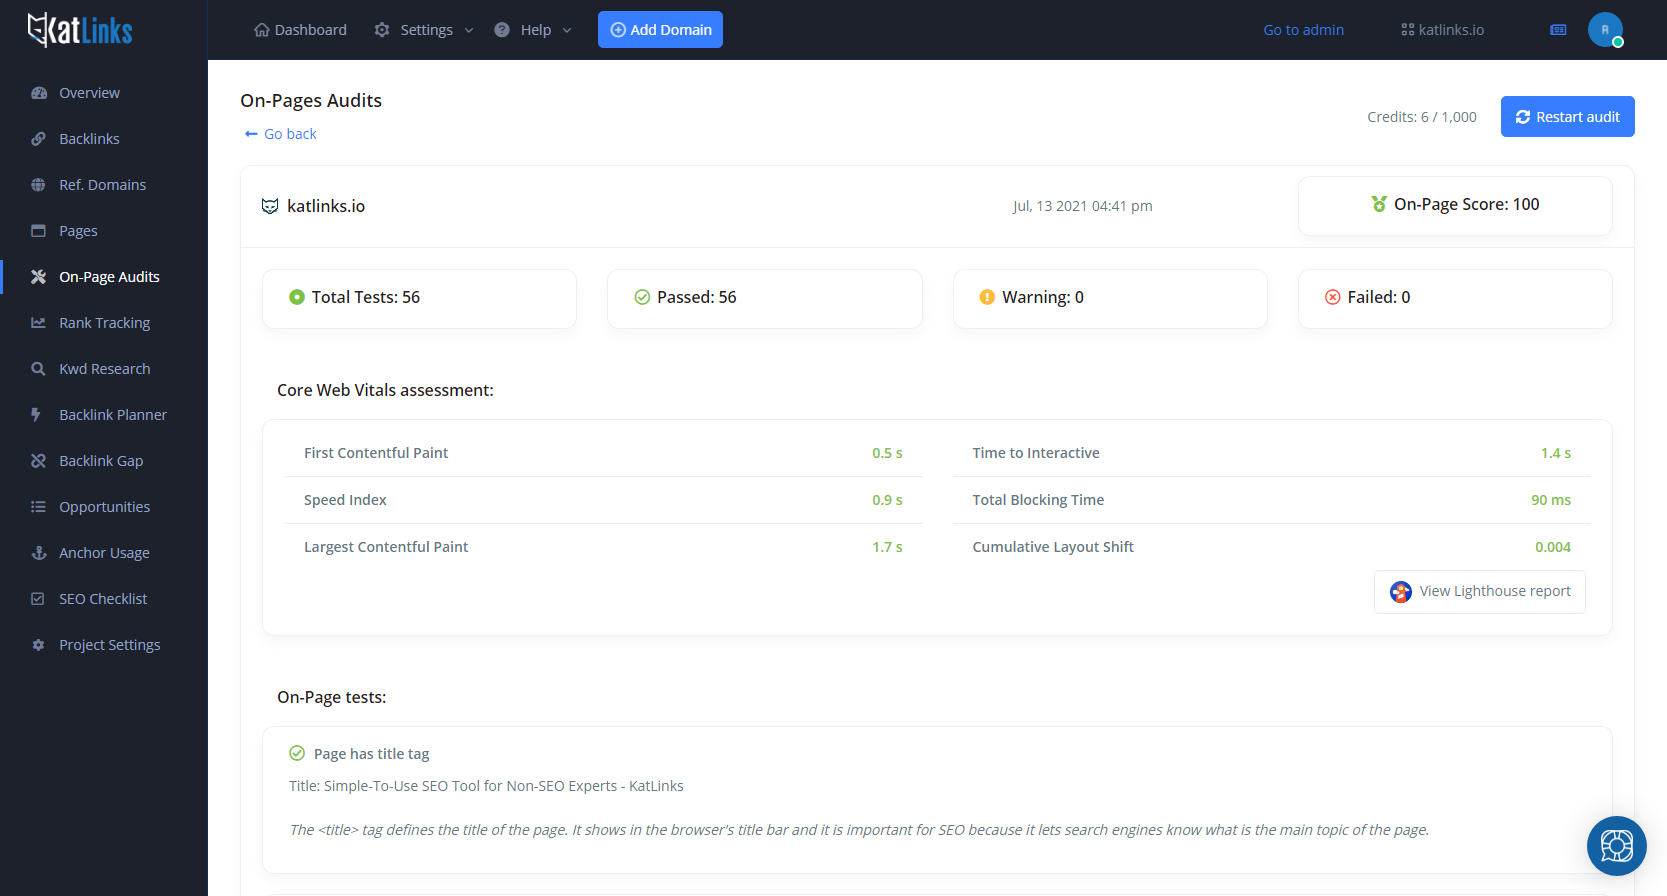 On-Page SEO Audit Tool